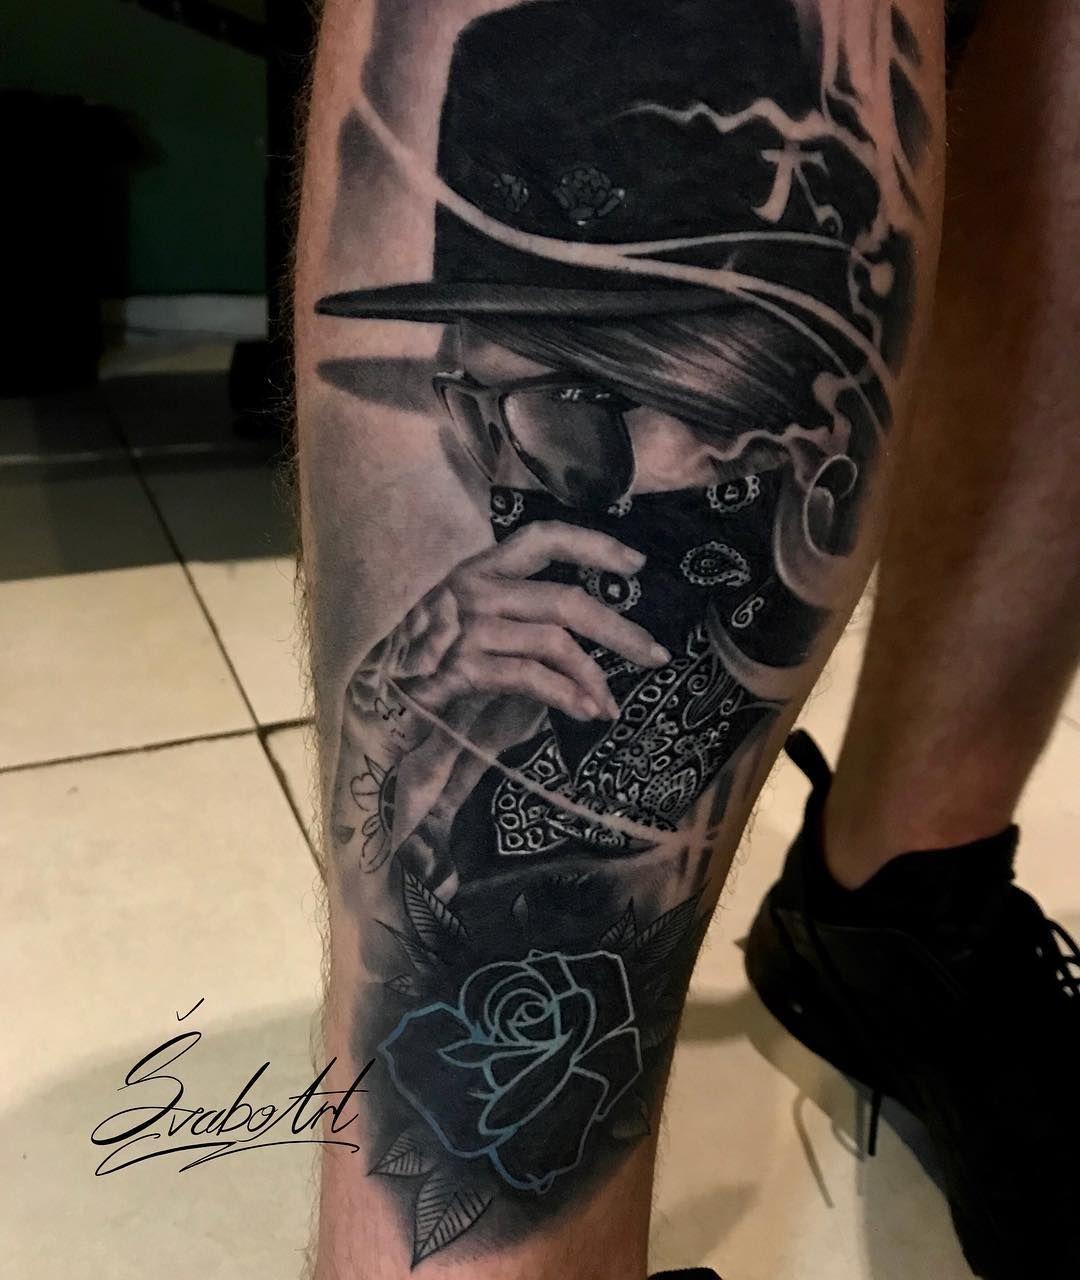 Healed Work Healed Healedtattoo Tattoo Tattooart Art Artist Ink Inked Inkedup Blackandgry Realistic Rose R Body Art Tattoos Tattoos Rose Tattoo